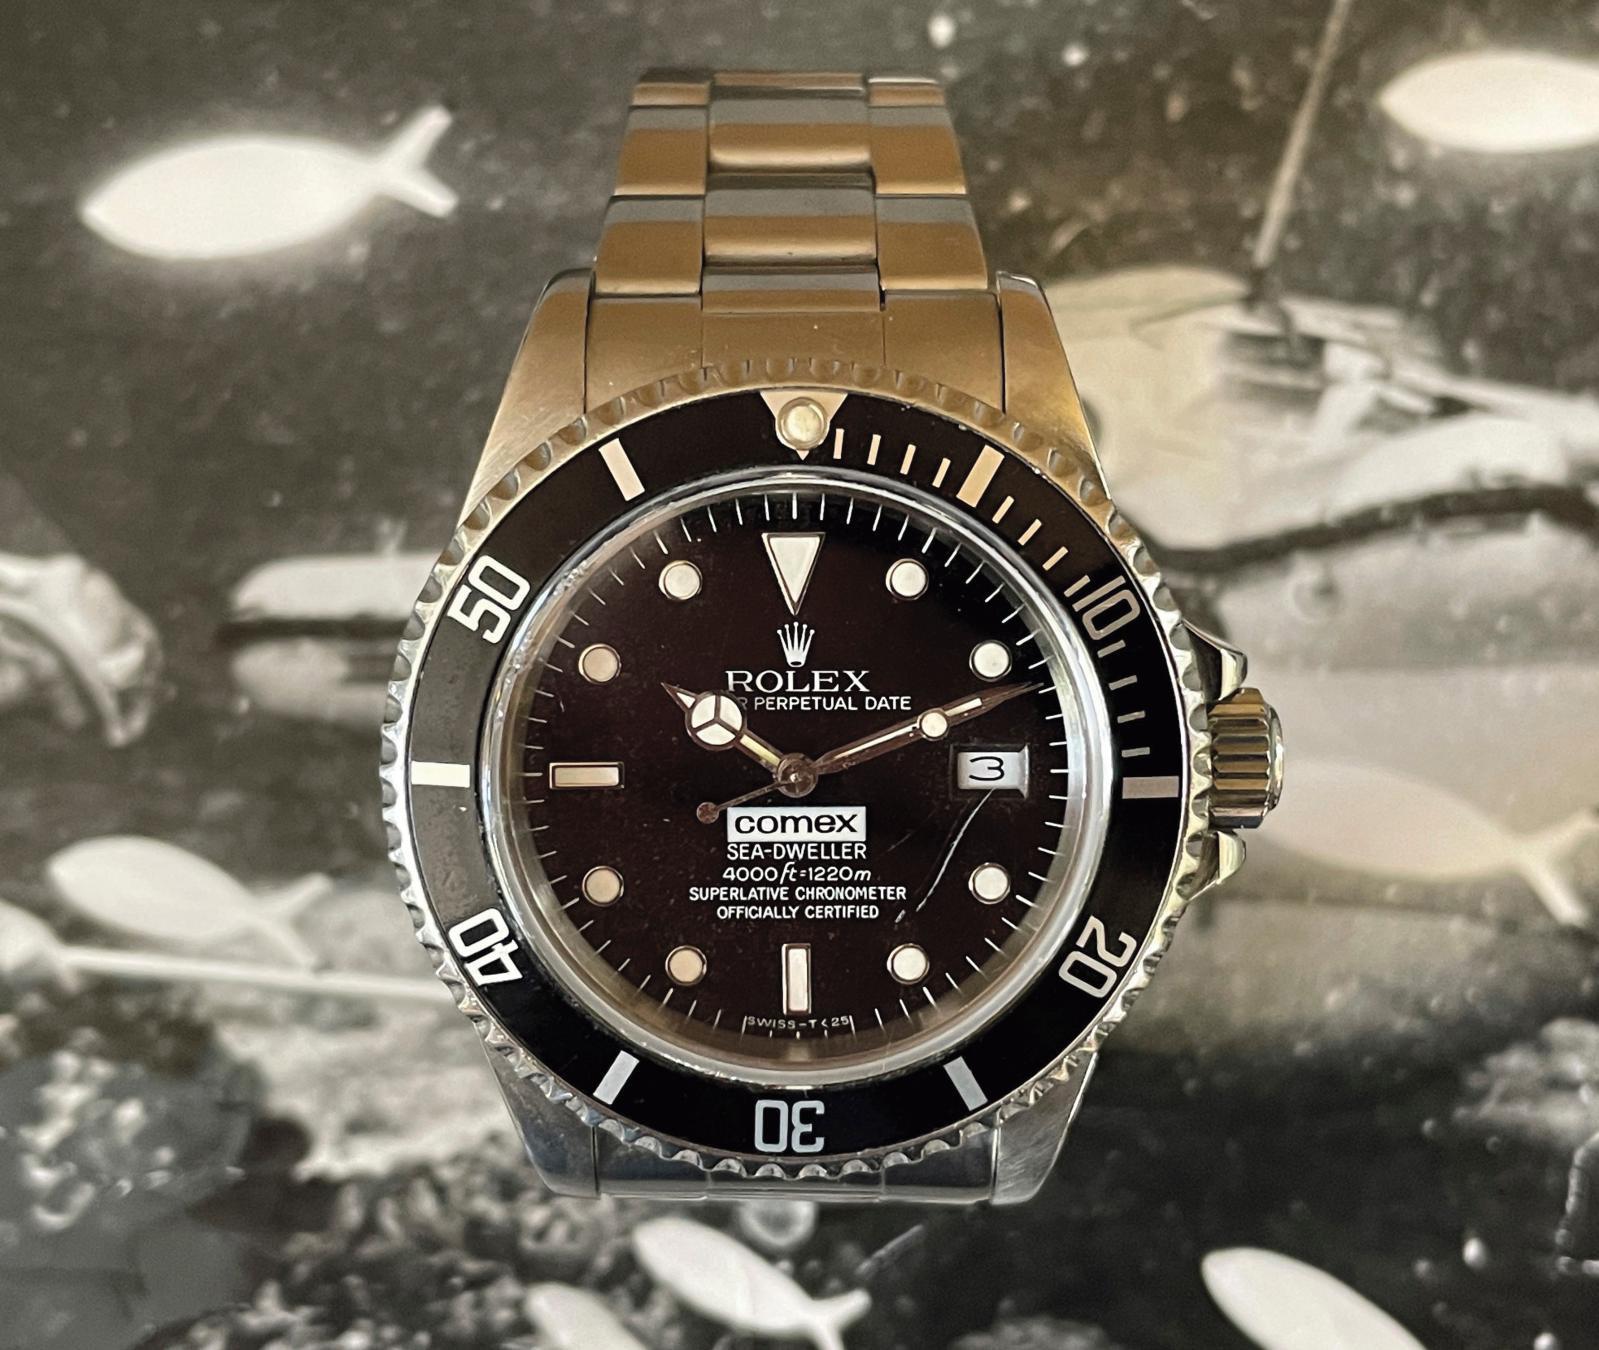 "Rolex ""Sea-Dweller Comex 4000 ft=1220m 3151"", reference 16660, no. 9304600, diver's wristwatch in steel, diam. 4 cm/1.57 in. Estimate: €50,000/70,000"